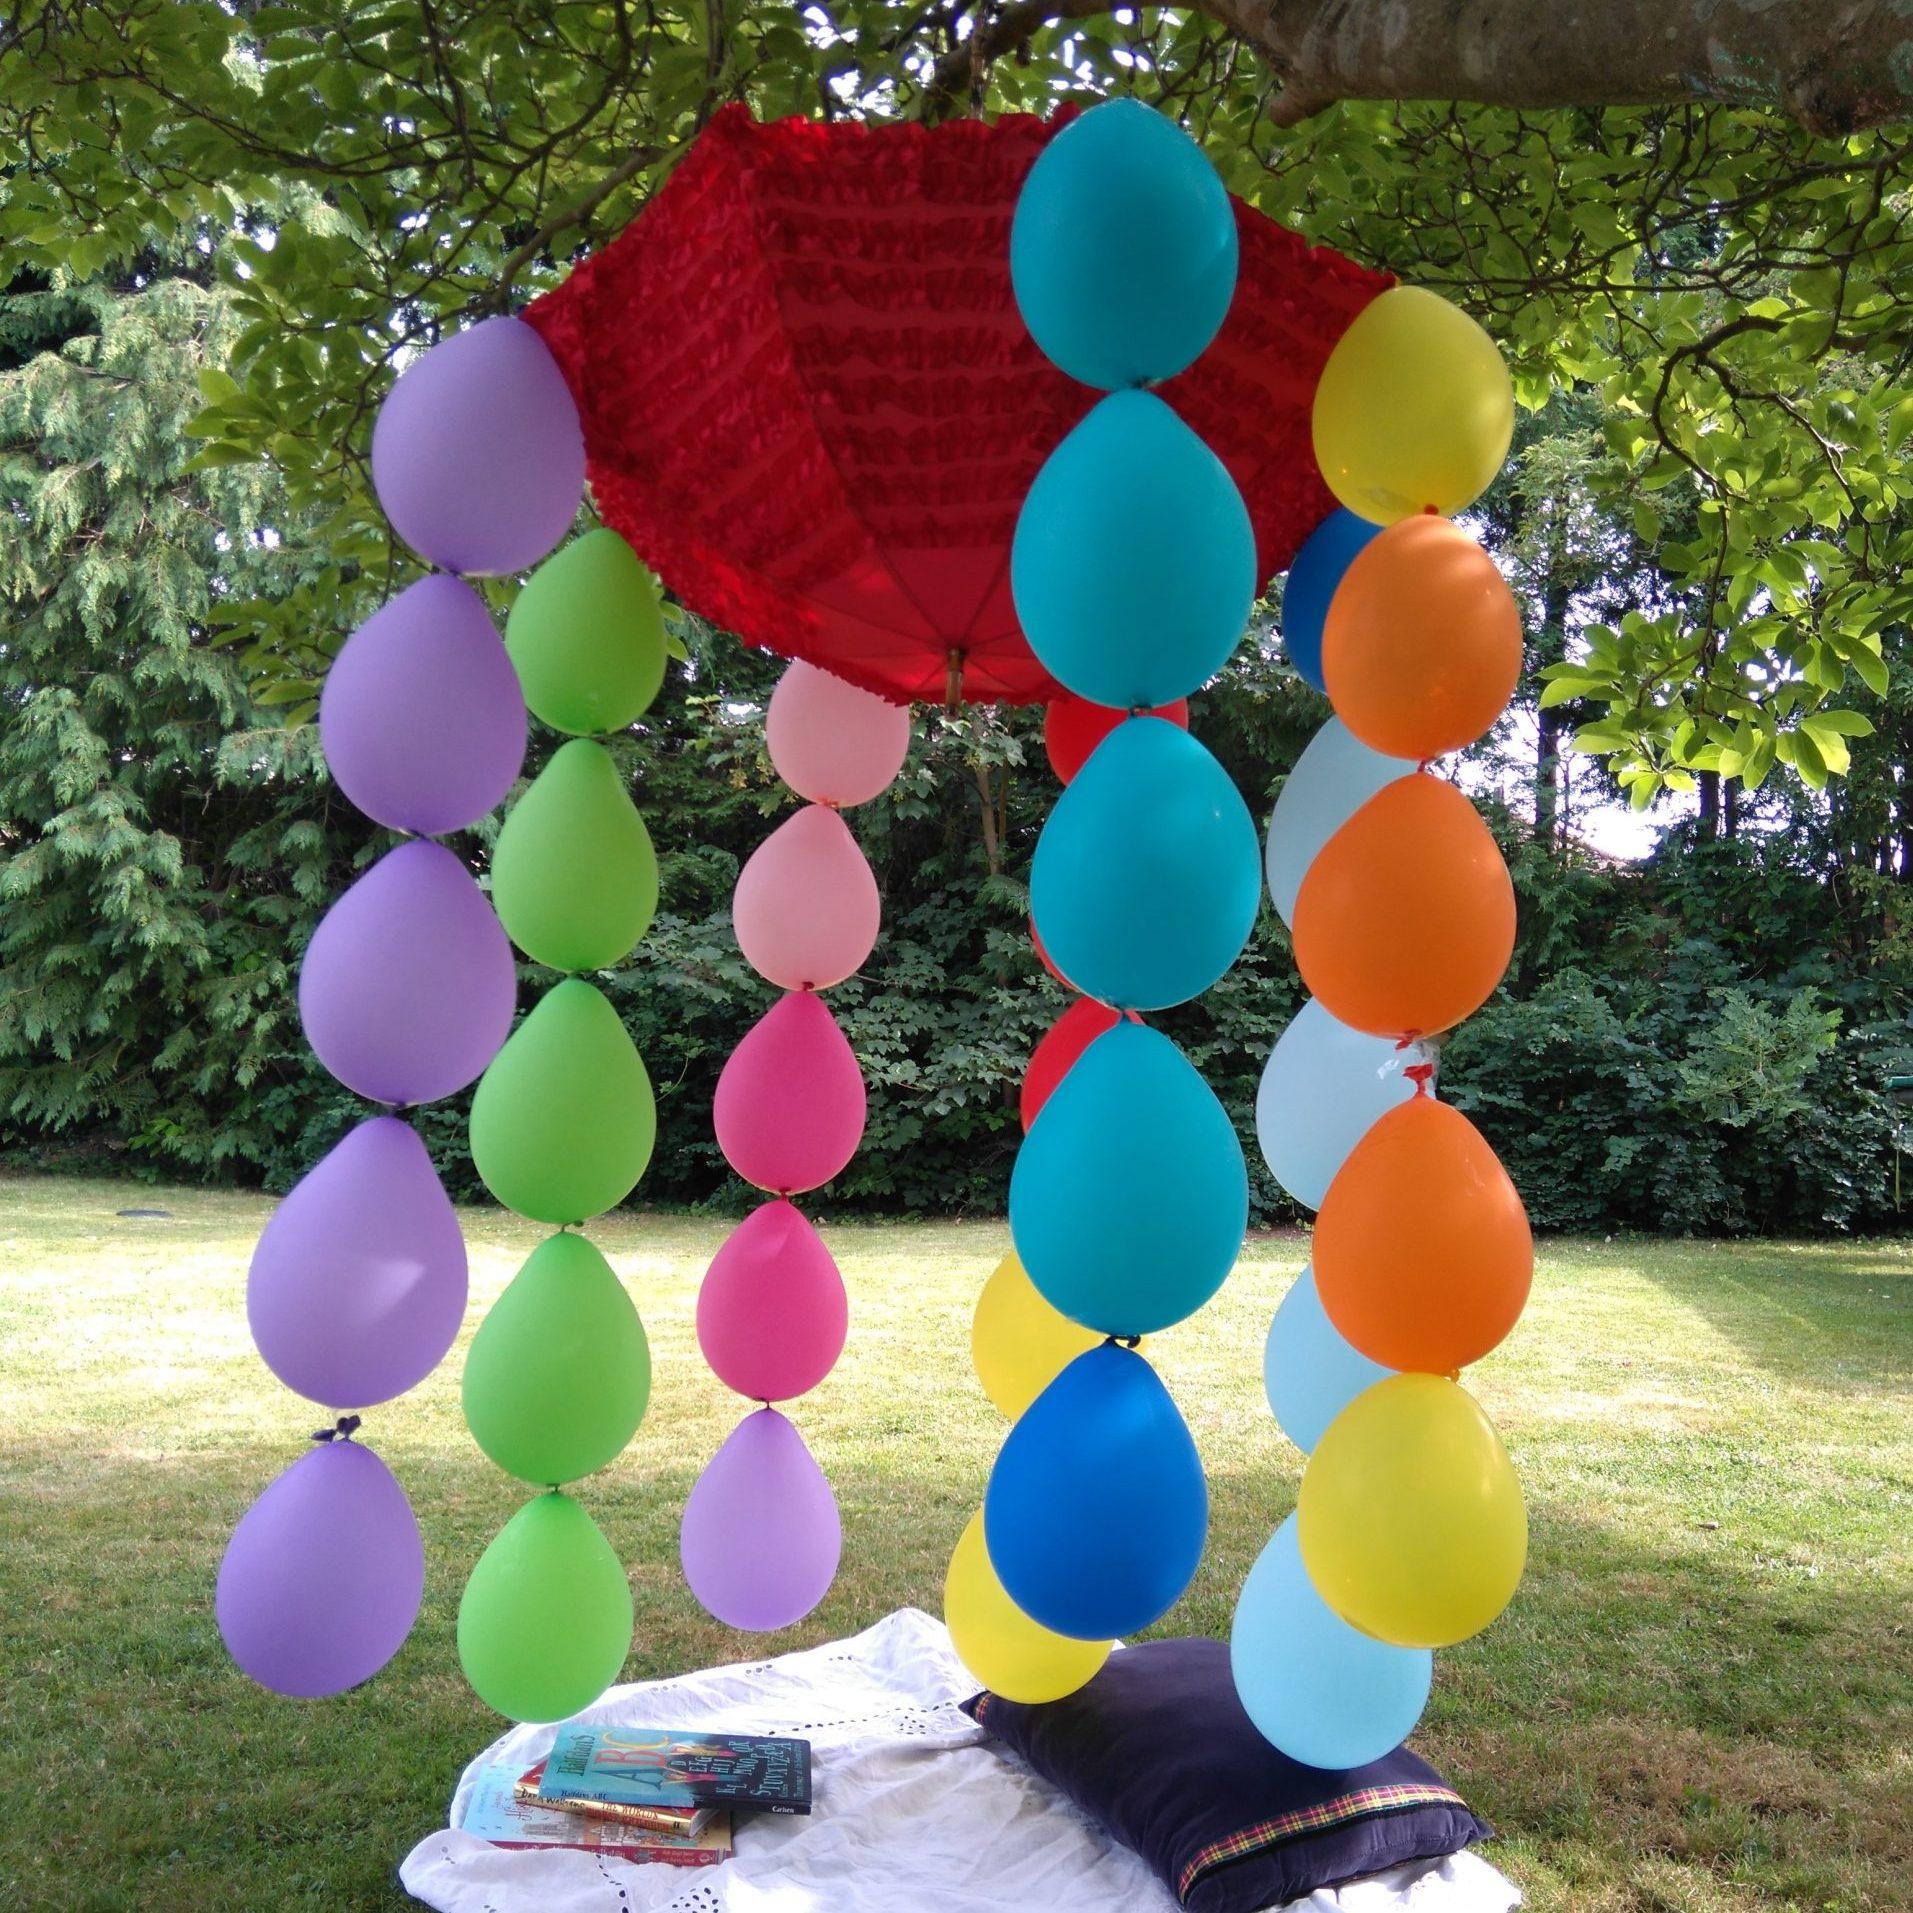 Make a compostable balloons den – A colourful & sustainable party idea!